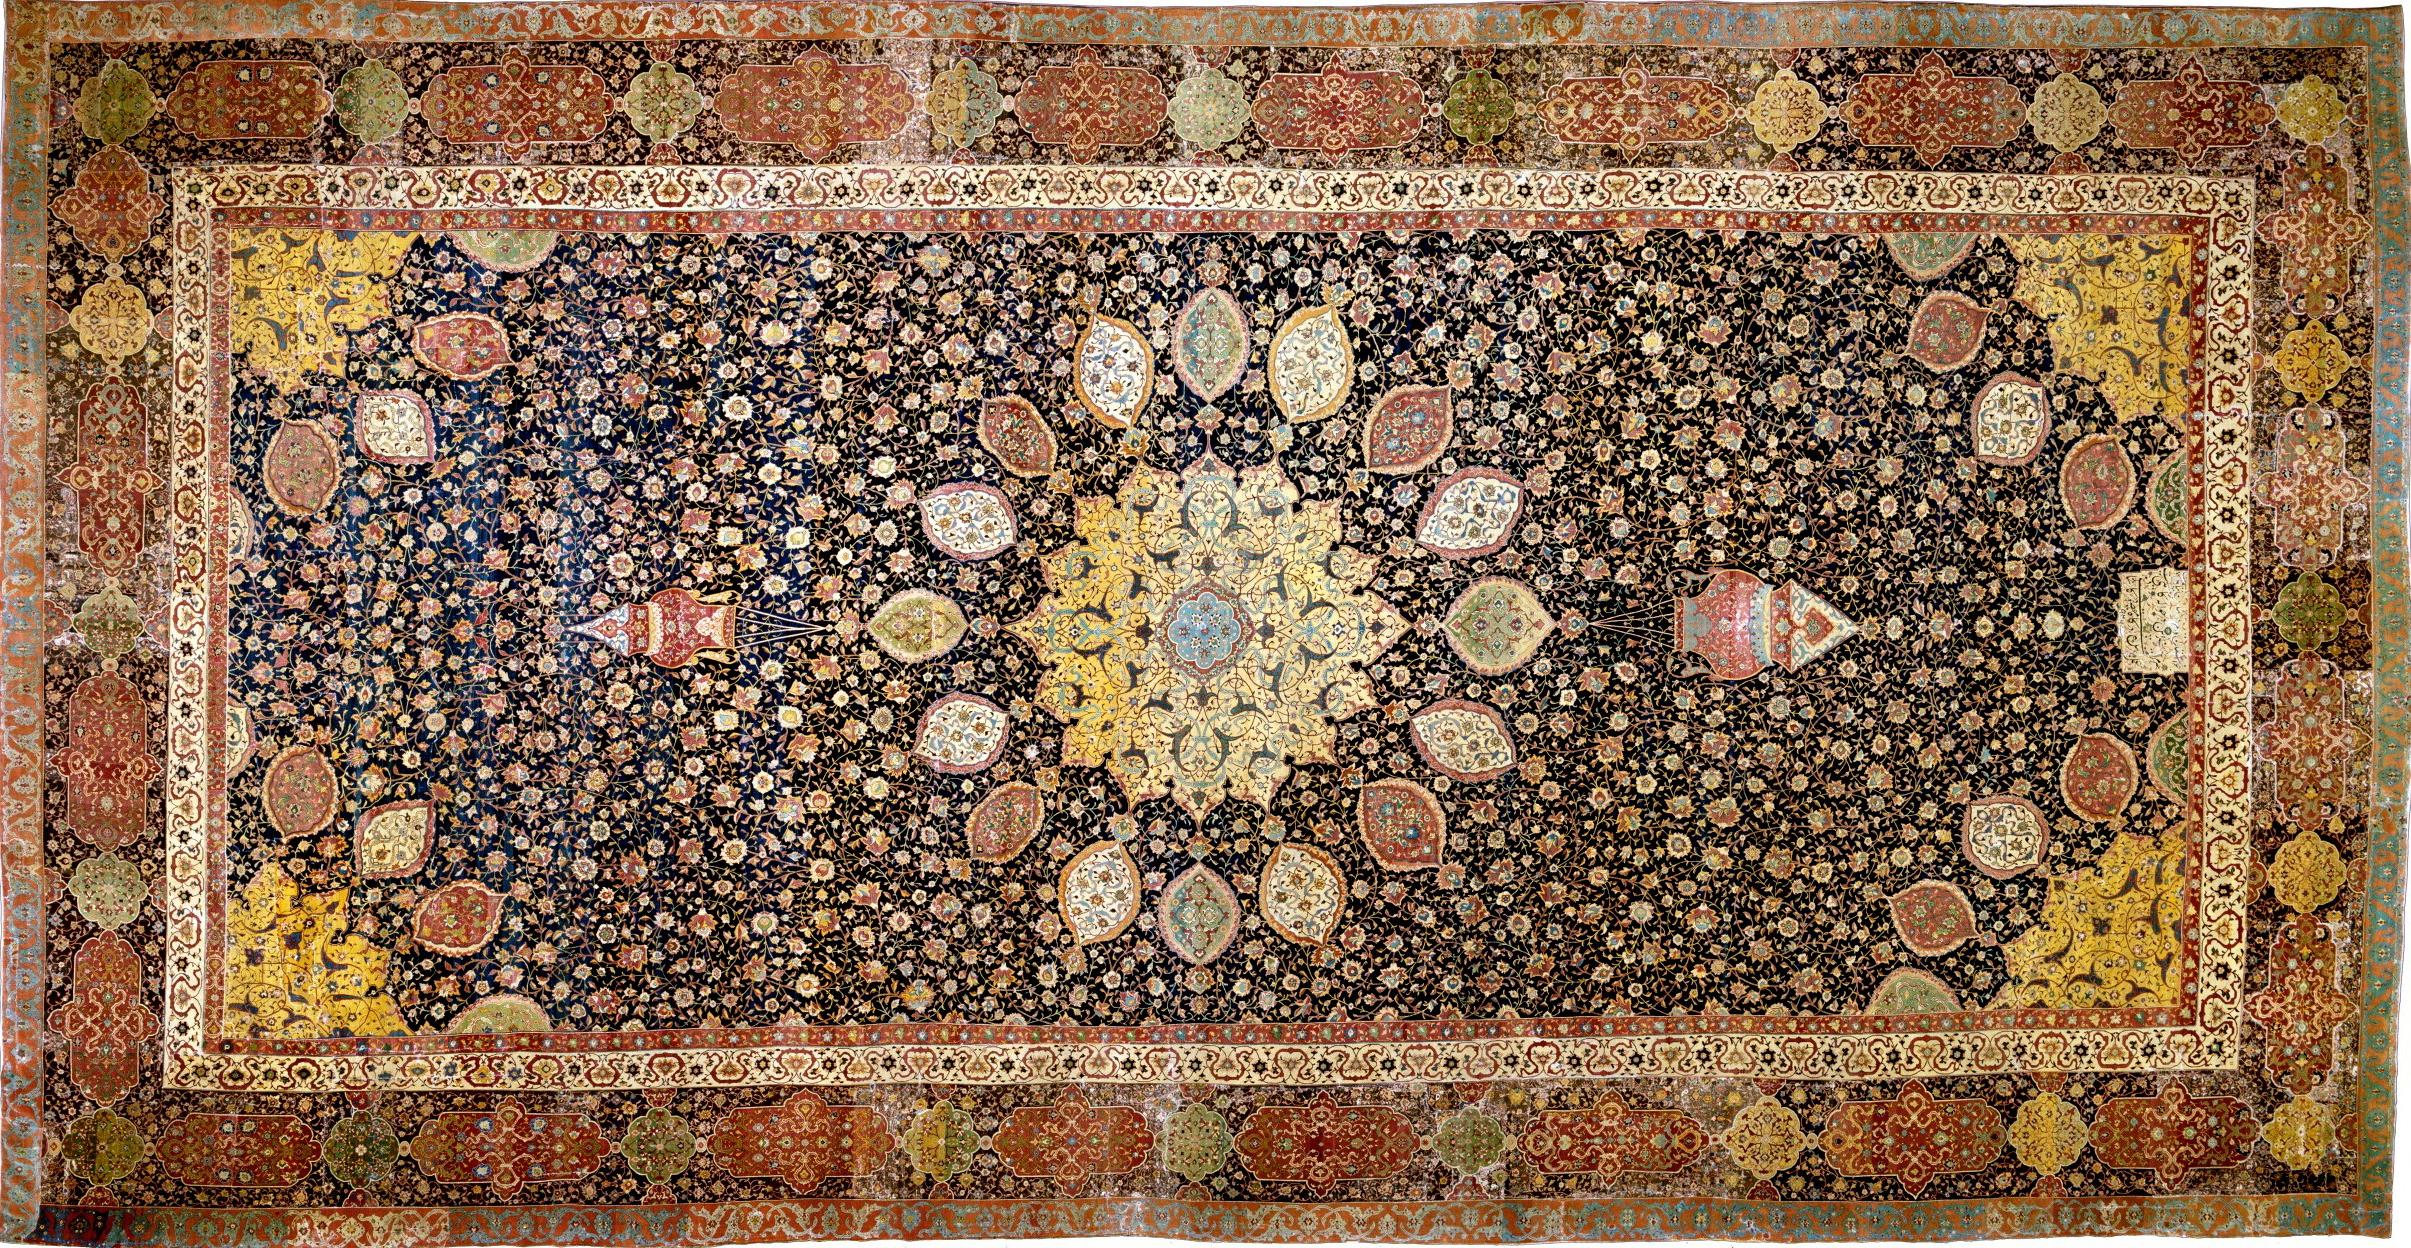 Tabriz Rug Wikipedia Karpet 250x350 Bcf Super Quality Style Ardabil Carpet Victoria And Albert Museum